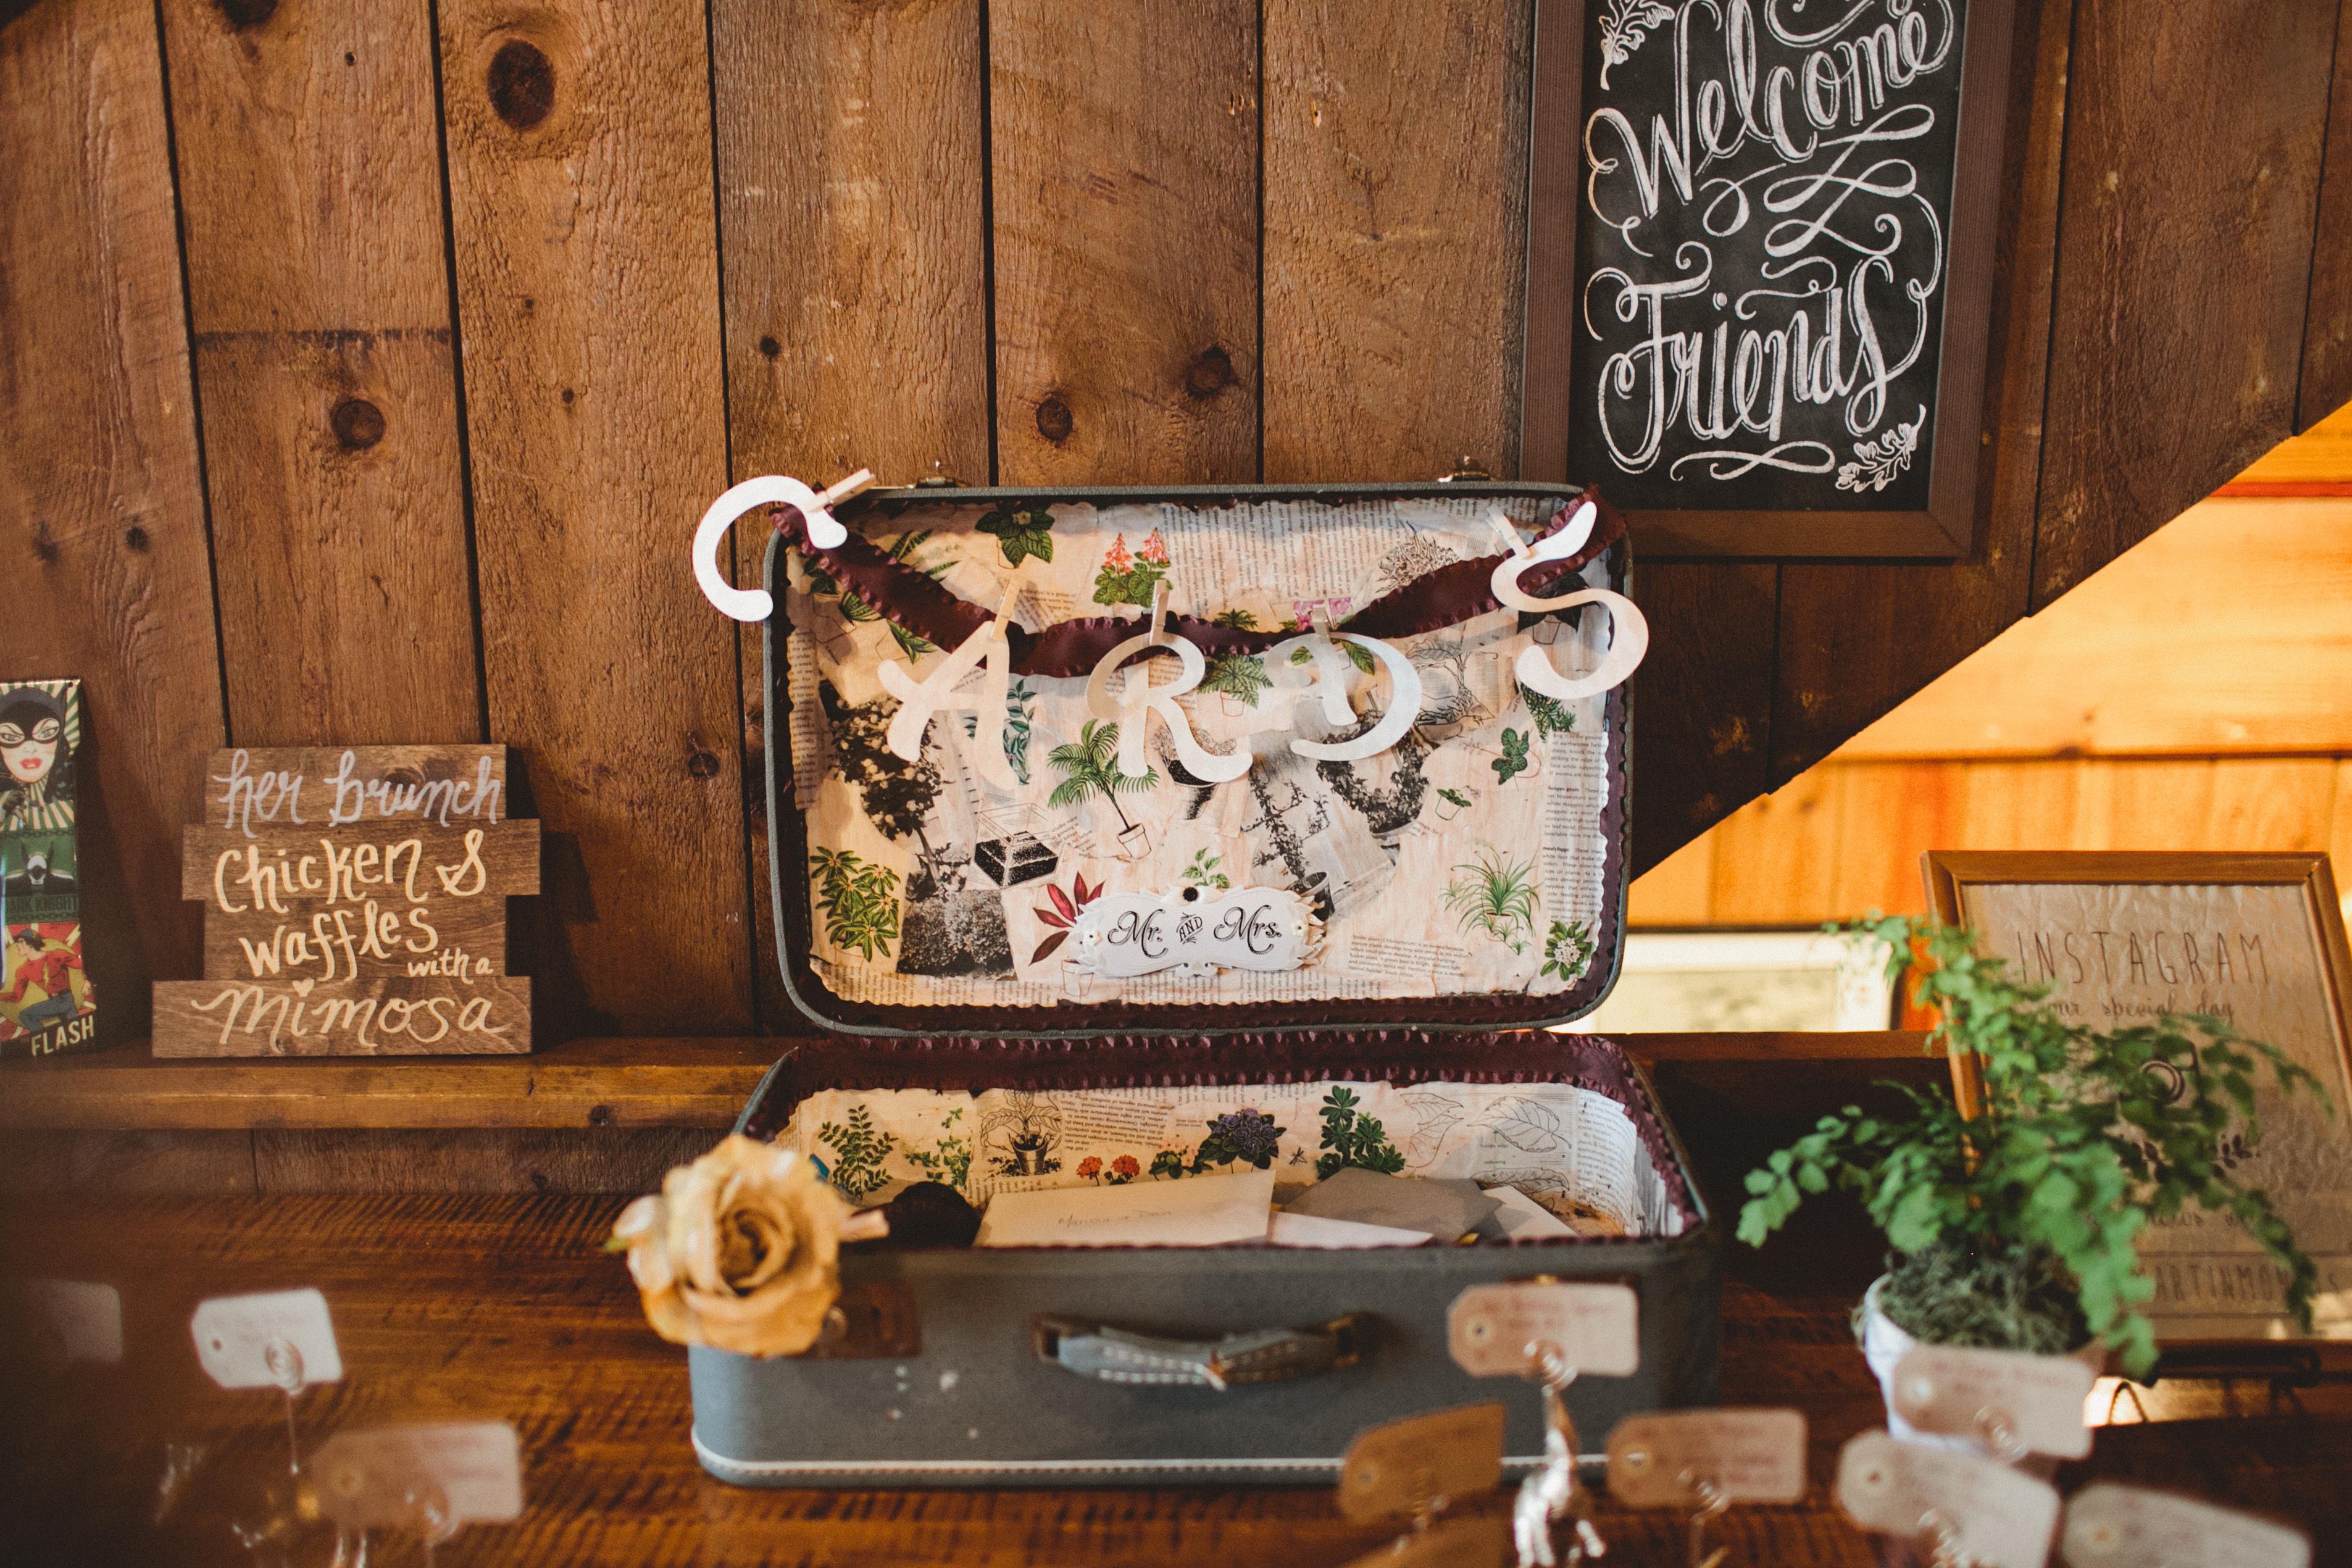 Marissa & Dan DIY - Suitcase Card Holder